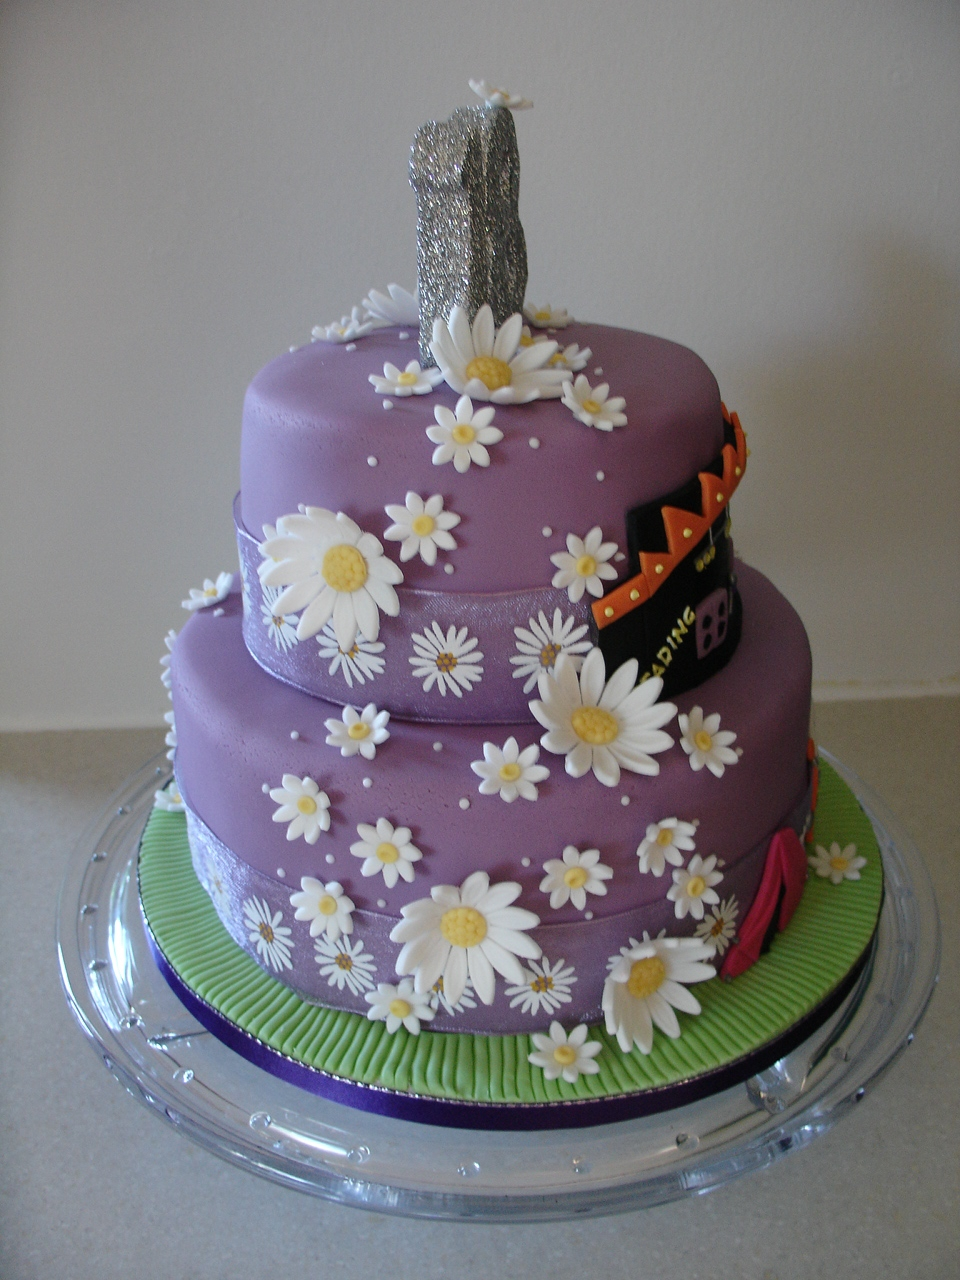 Music Festival 18th Birthday Fondant Cake Cakecentral Com